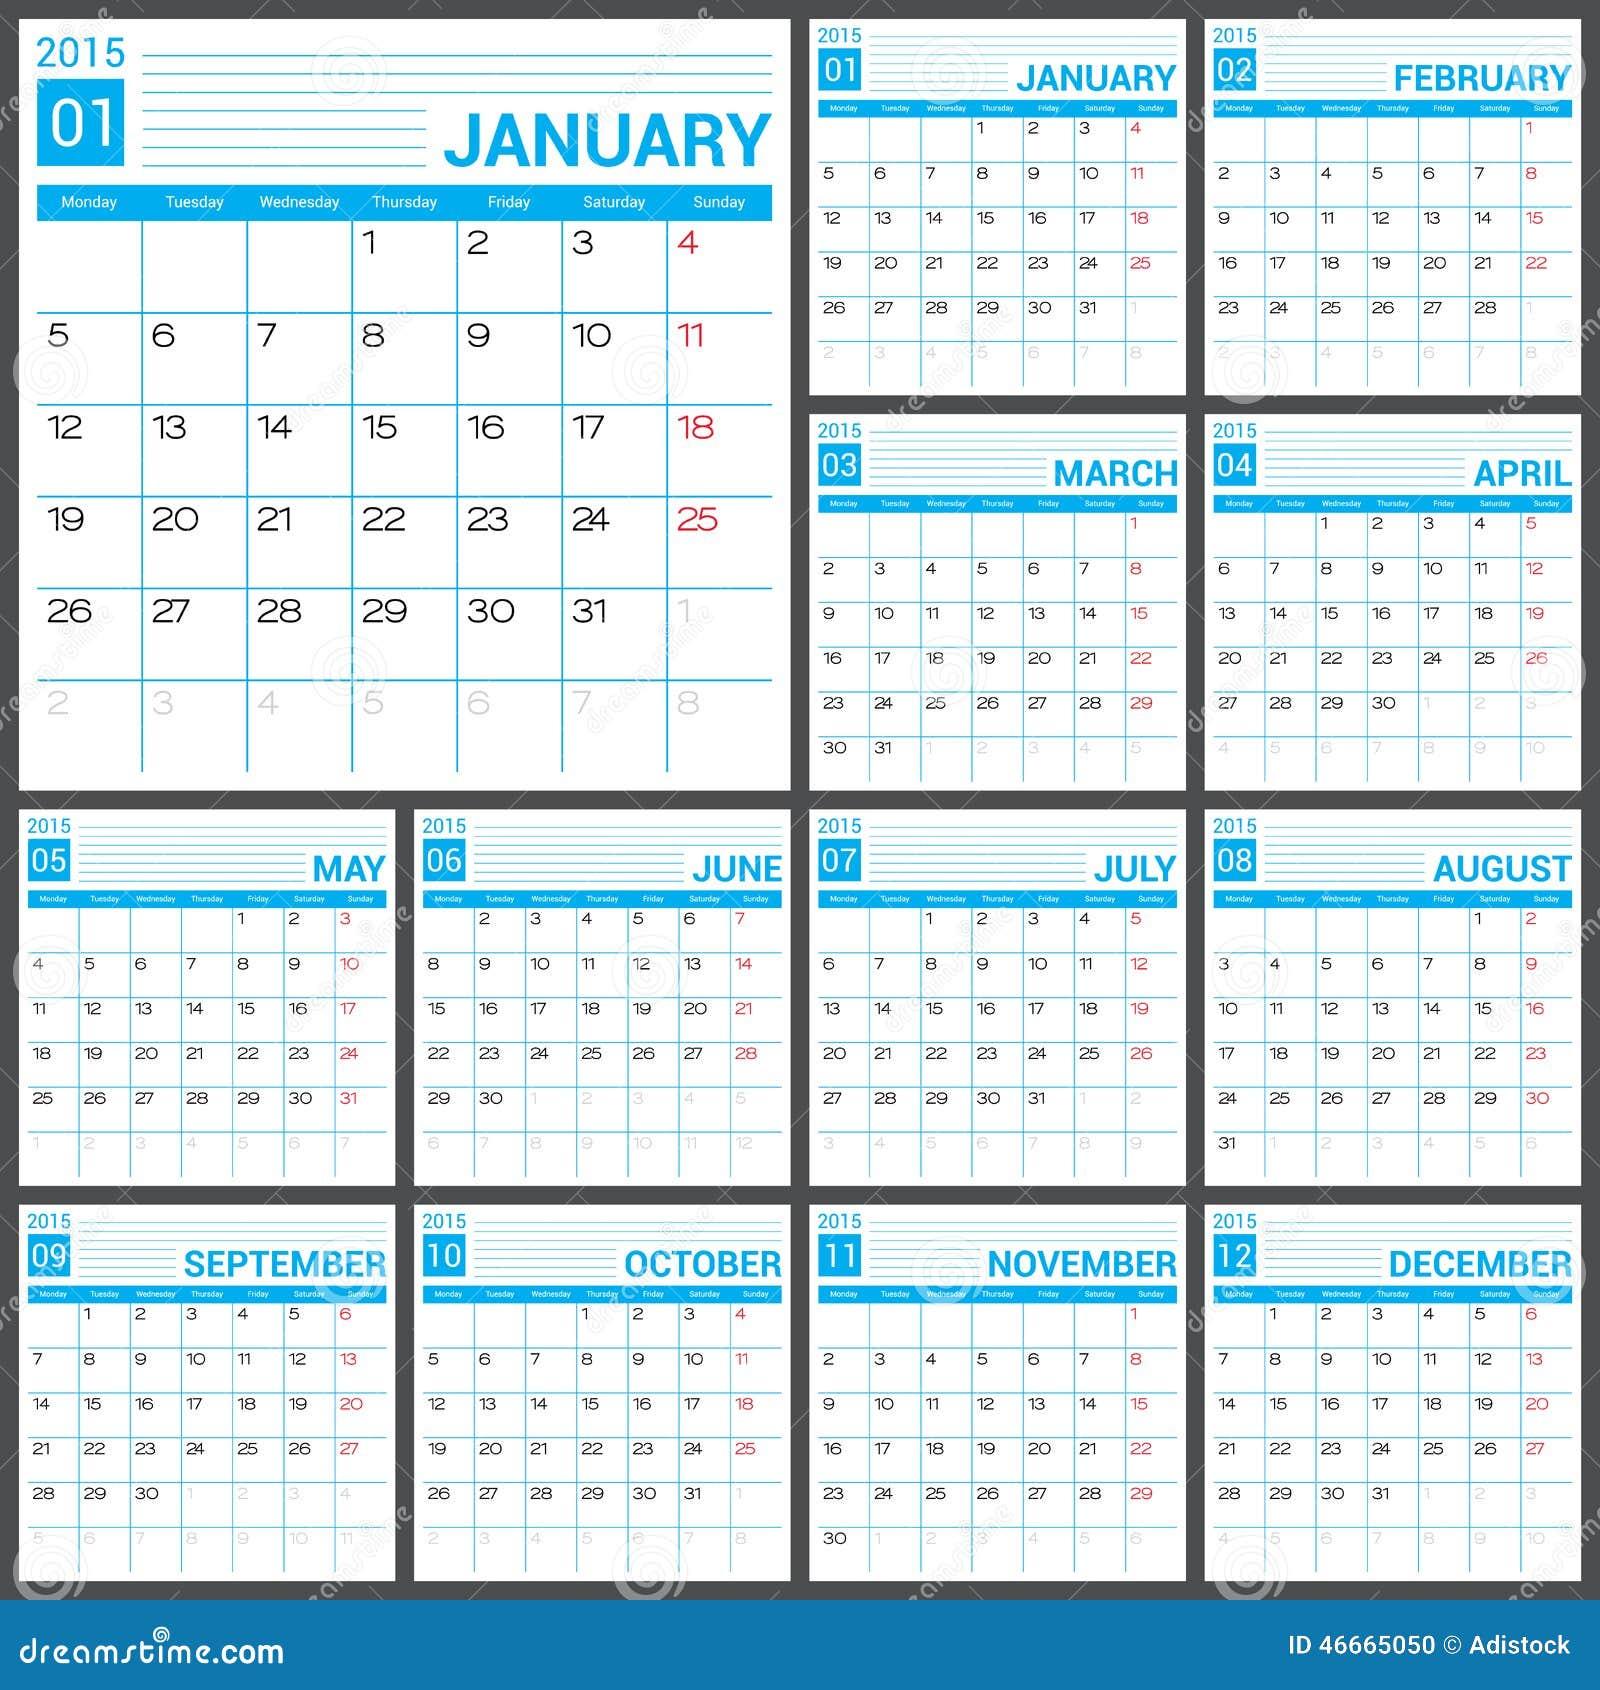 Blank Calendar Svg : Calendar vector desing template stock image